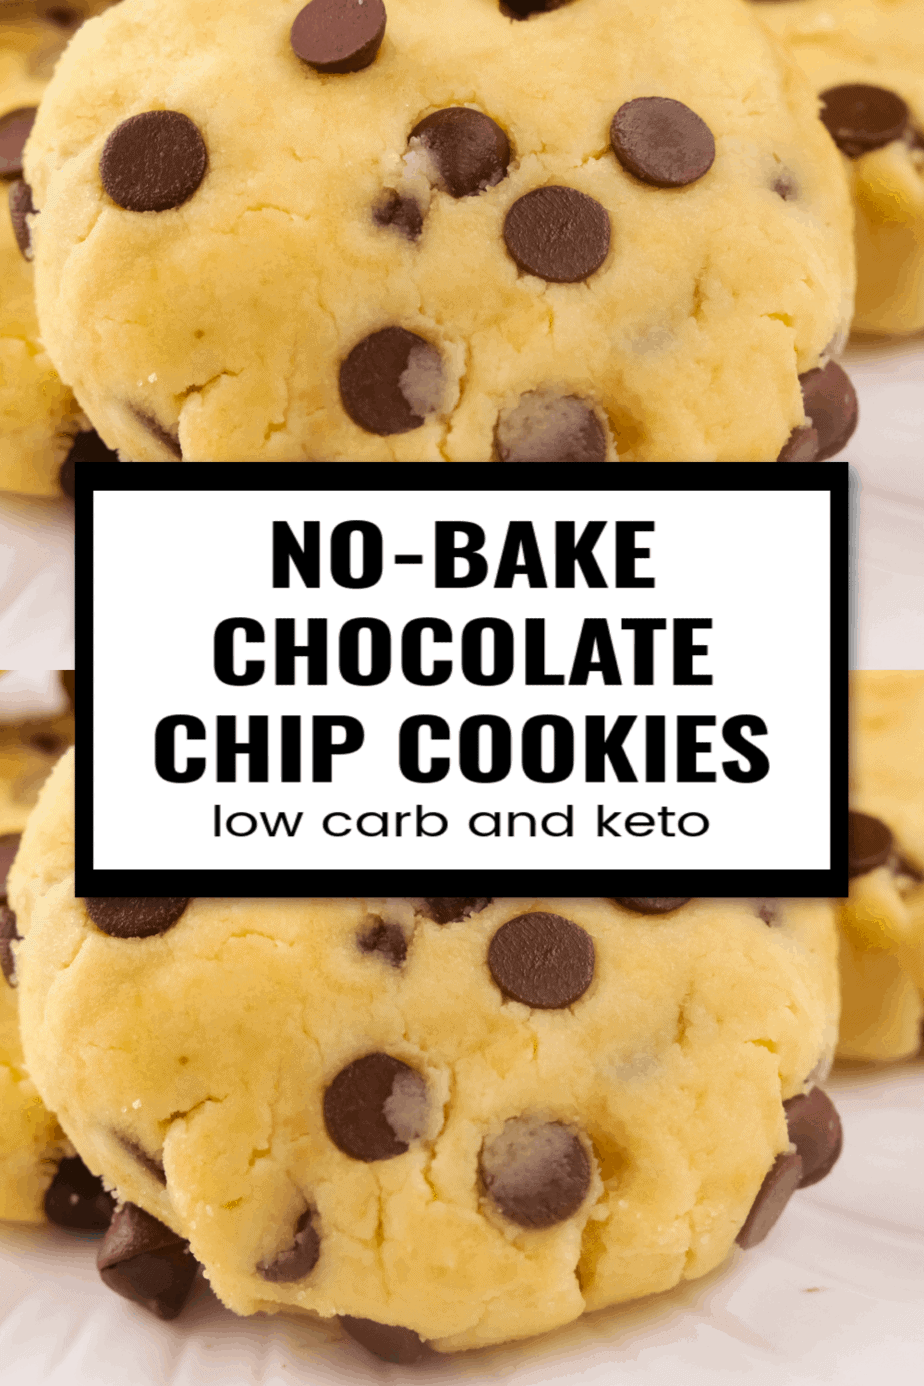 Keto No-bake Chocolate Chip Cookies Recipe